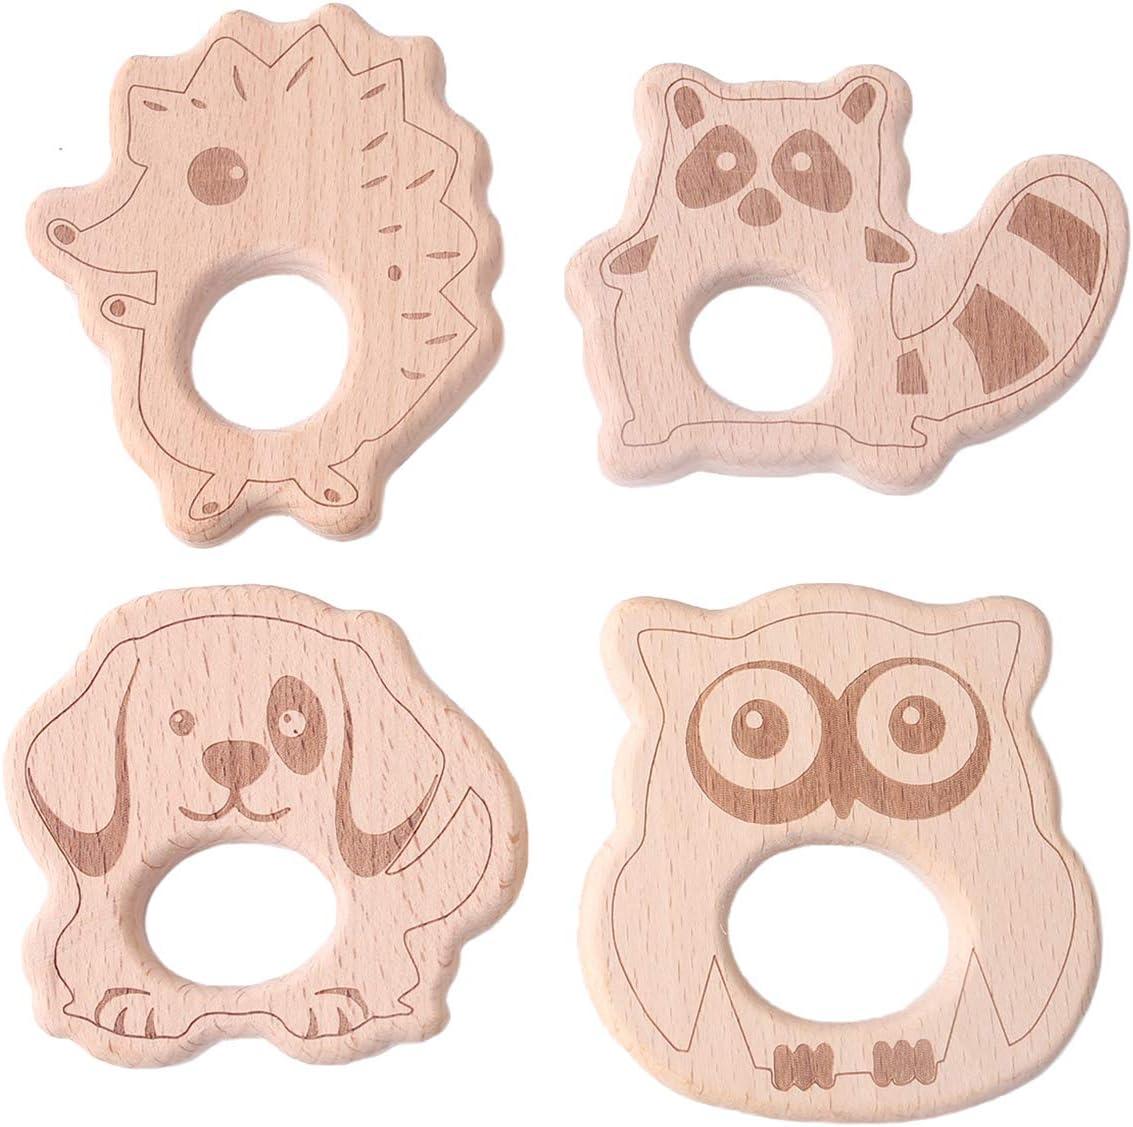 Promise Babe 4pc Kit Pendiente de Madera para Animales Diy Accesorios de Enfermería Mordedor Madera Erizo Mapache Búho Perro Juguete de Dentición para Bebés Juguetes Monterey